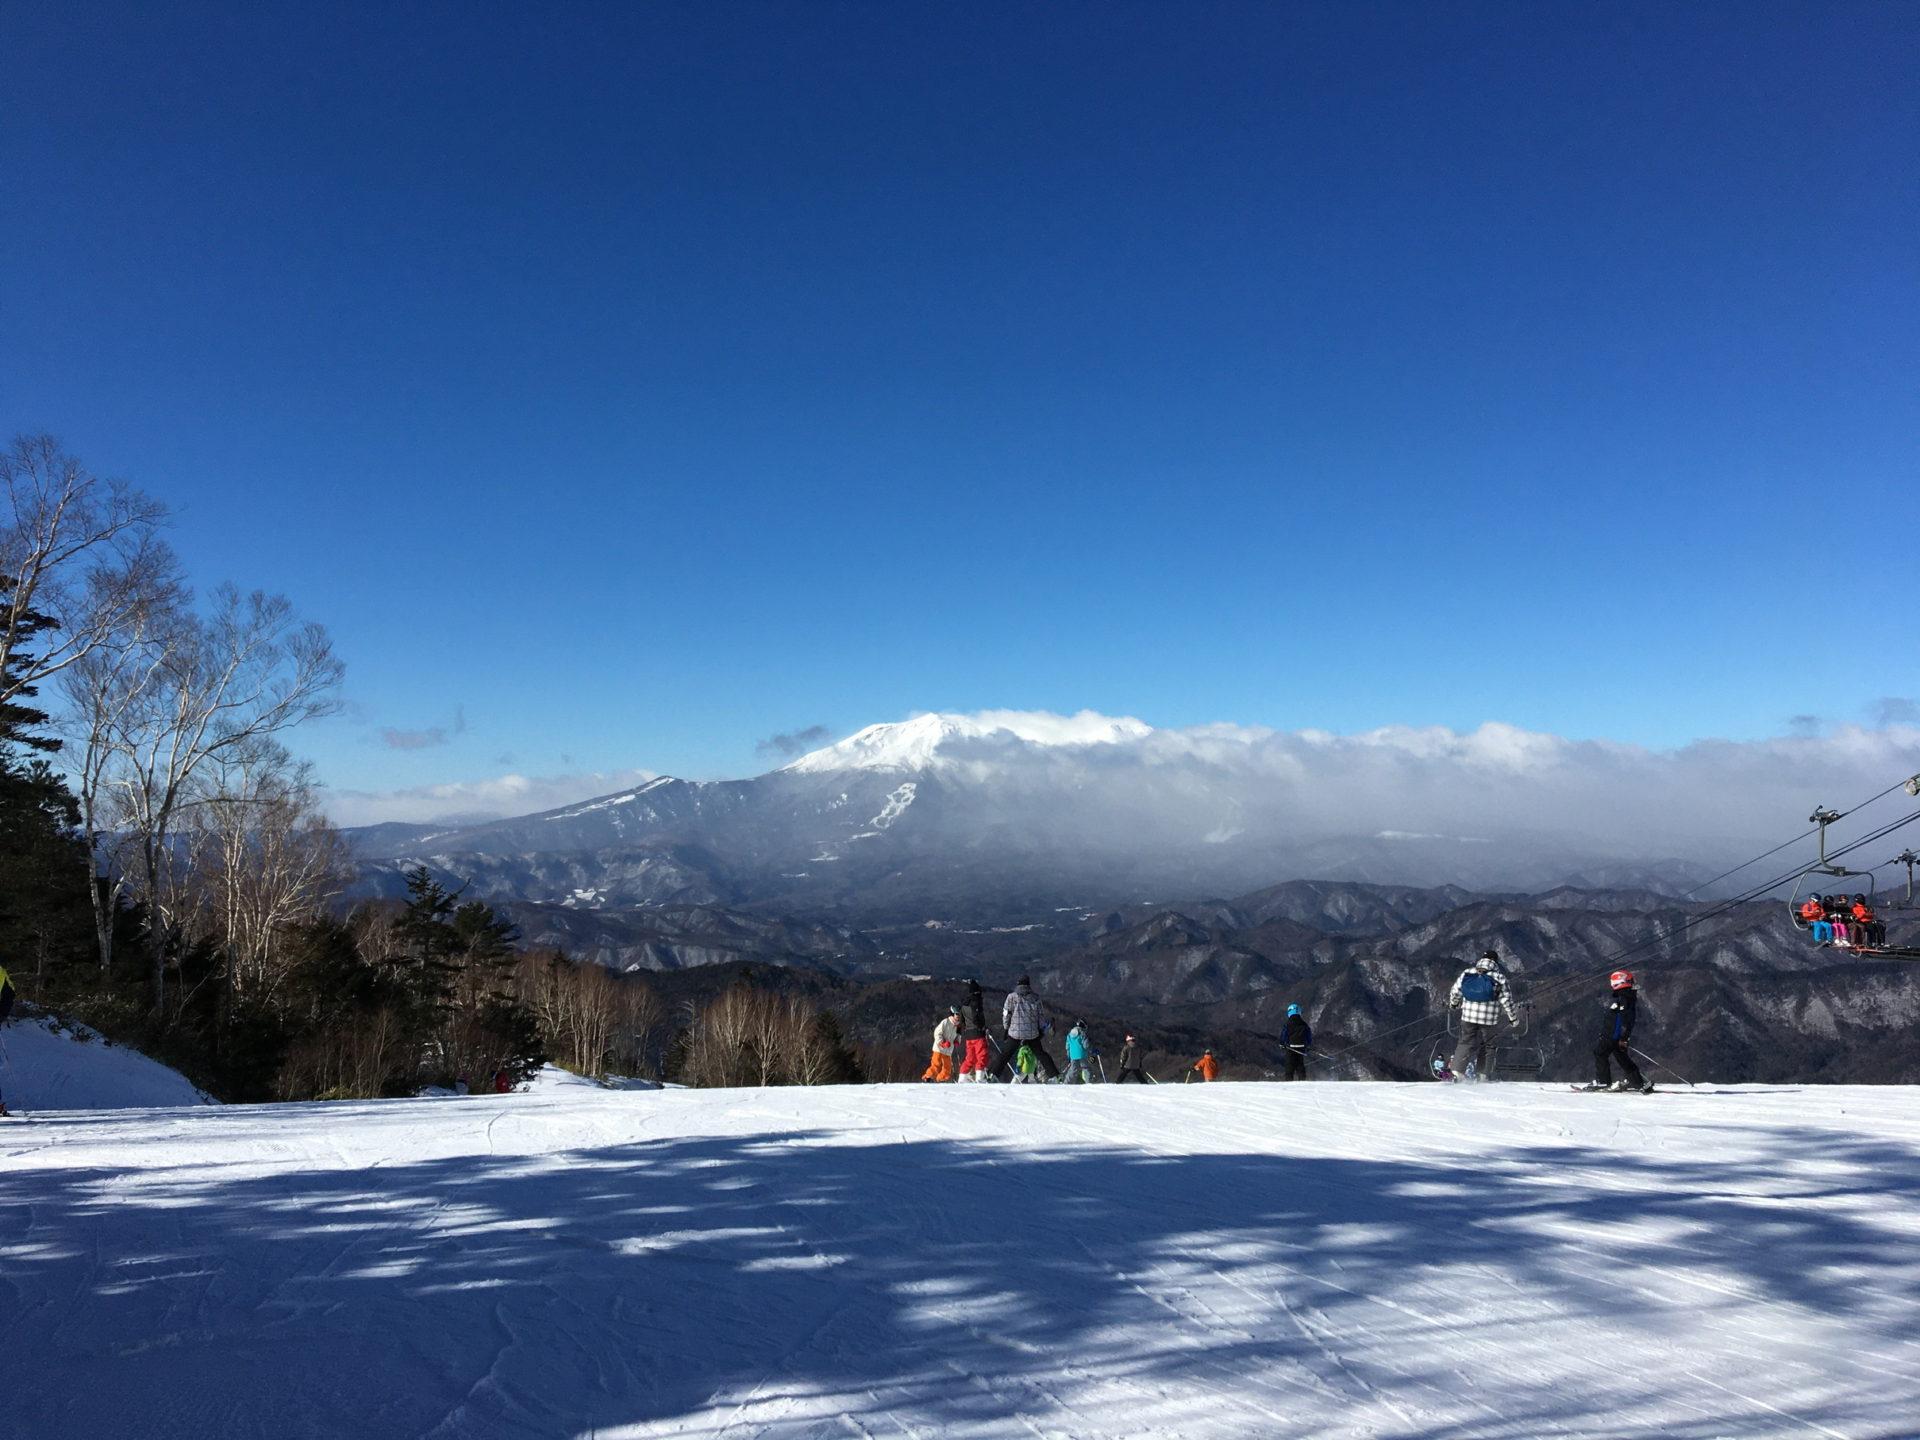 木曽 福島 スキー 場